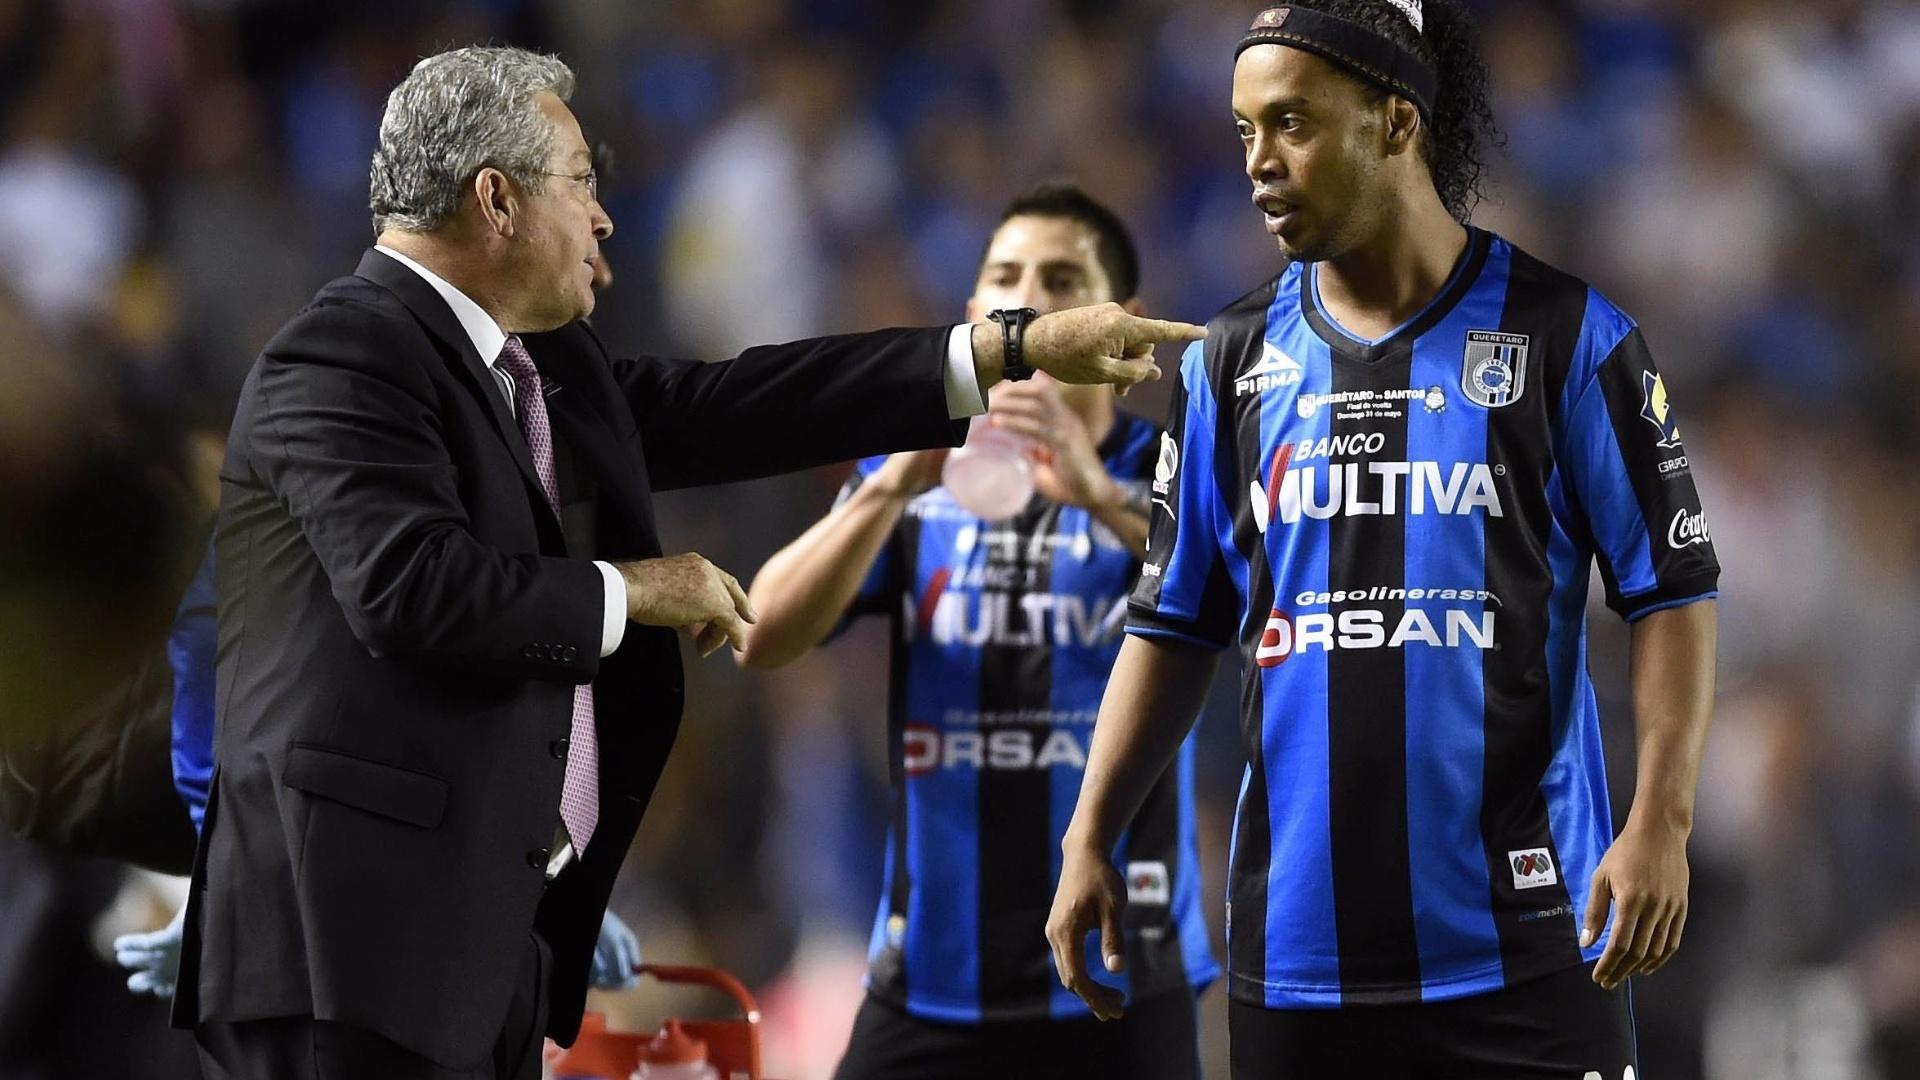 Manuel Vucetich, técnico do Querétaro, orienta Ronaldinho na partida contra o Santos Laguna pelas finais do Clausura 2015 do Campeonato Mexicano